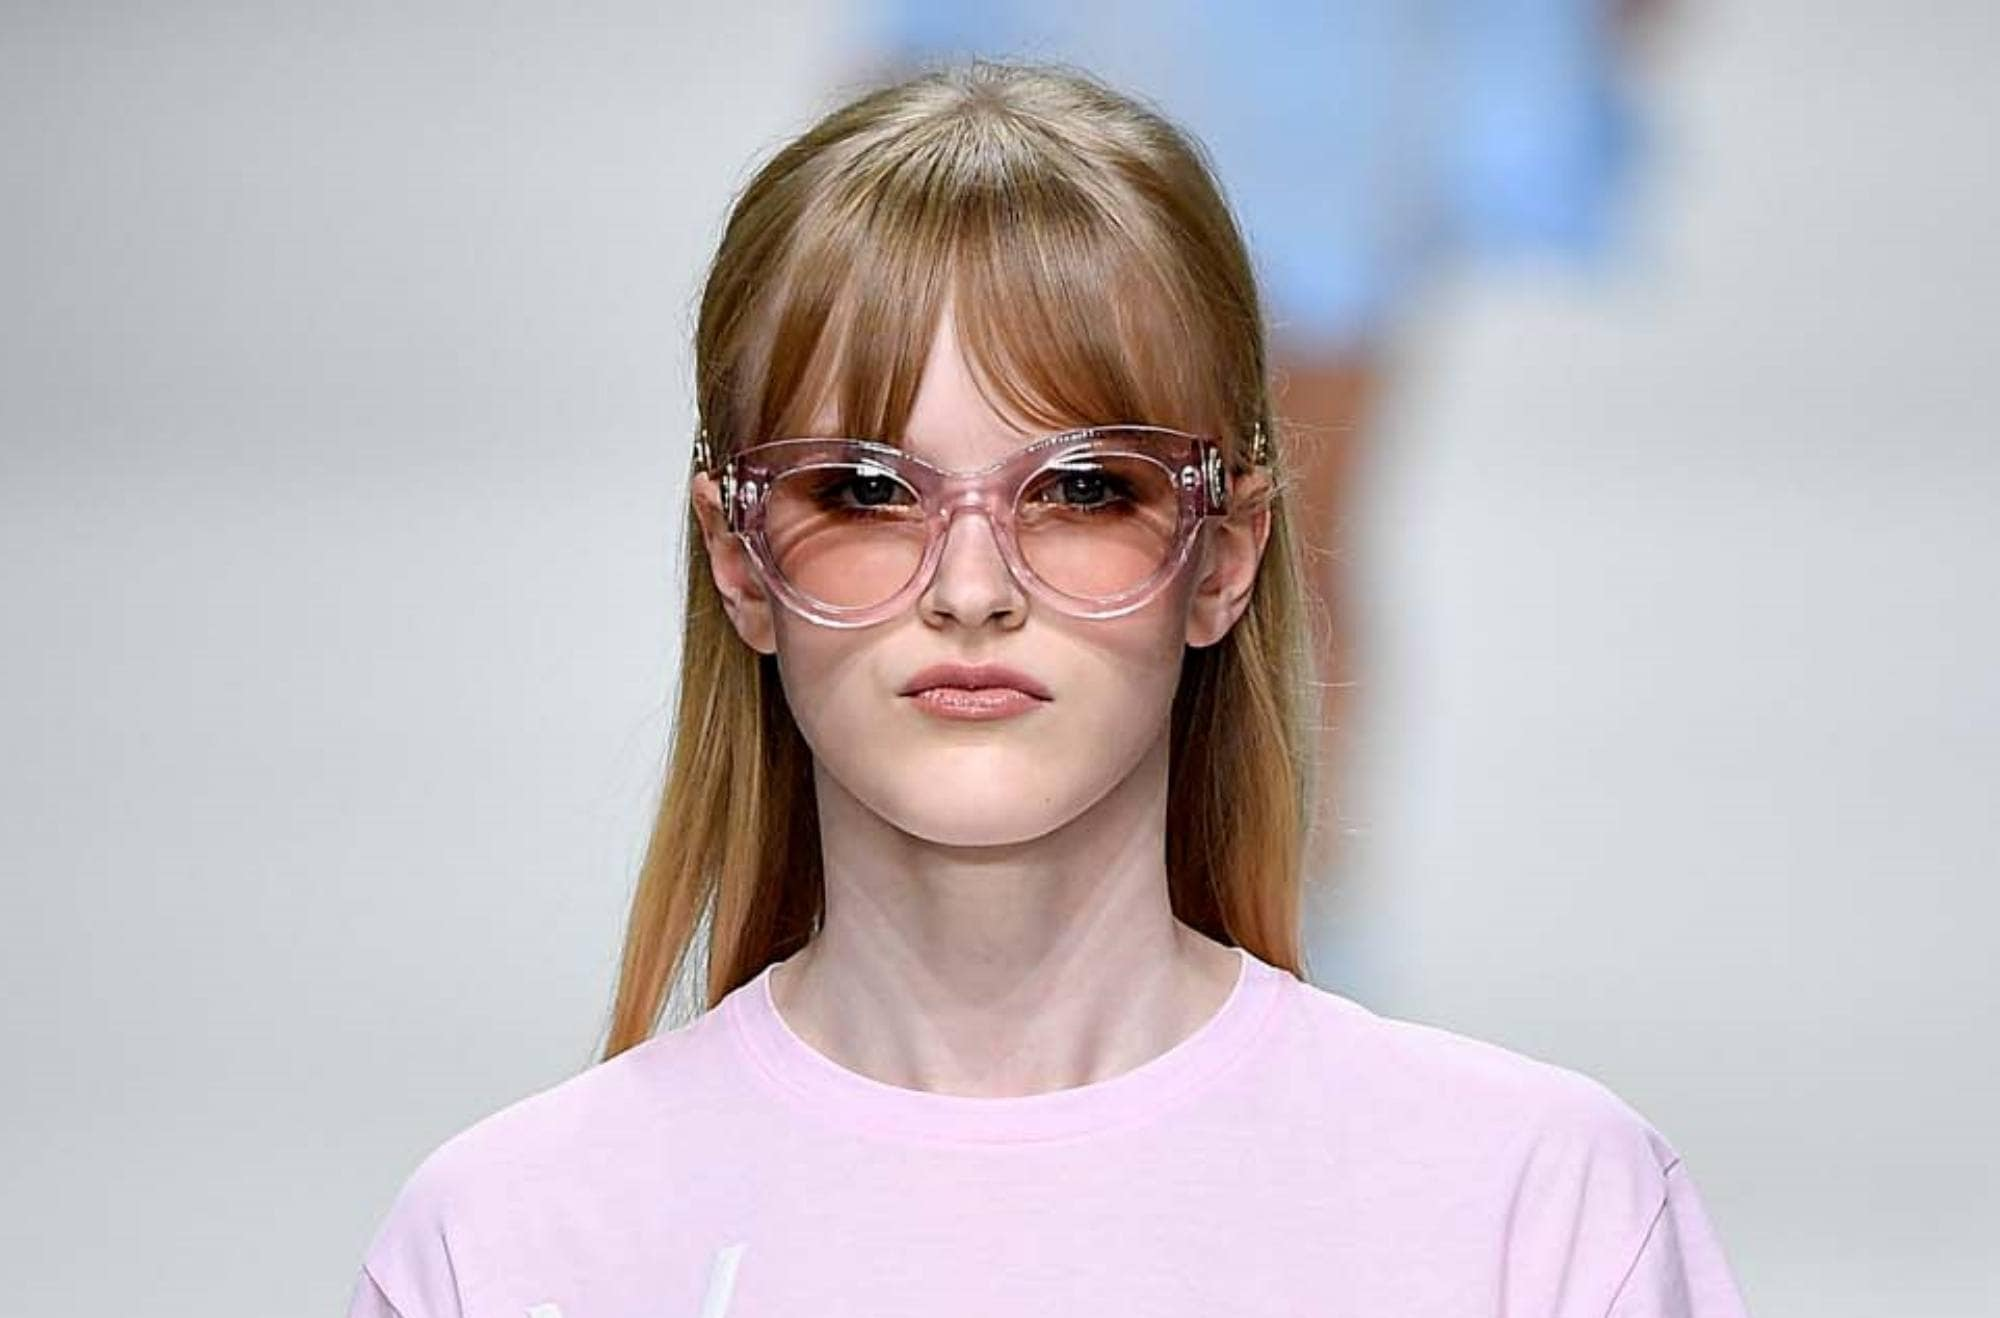 Sleek tied hair: Closeup shot of a Caucasian woman with long brown hair with bangs wearing shades and pink shirt